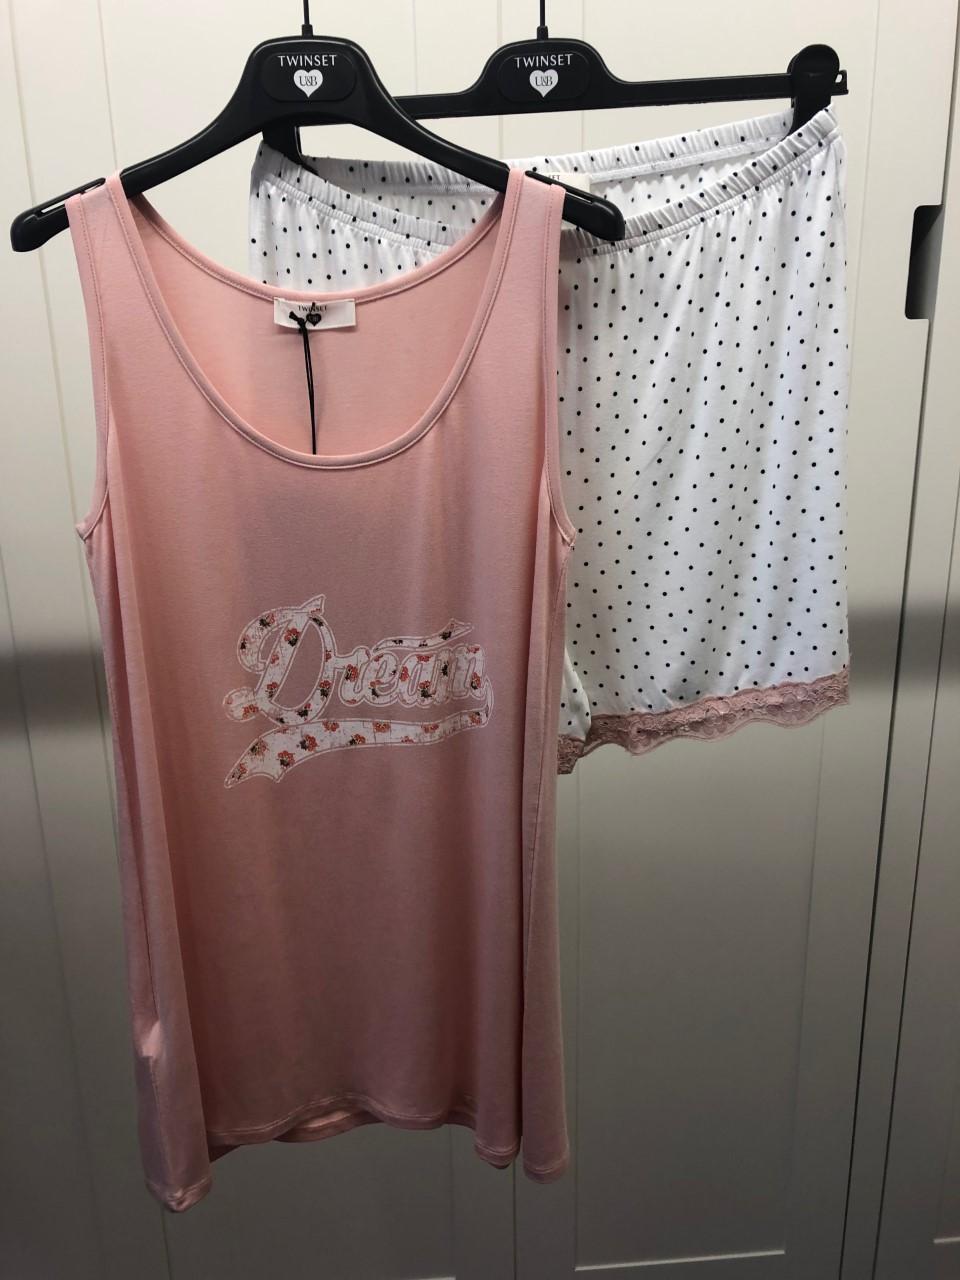 Twin-Set Damespyjama-short Dream SS20